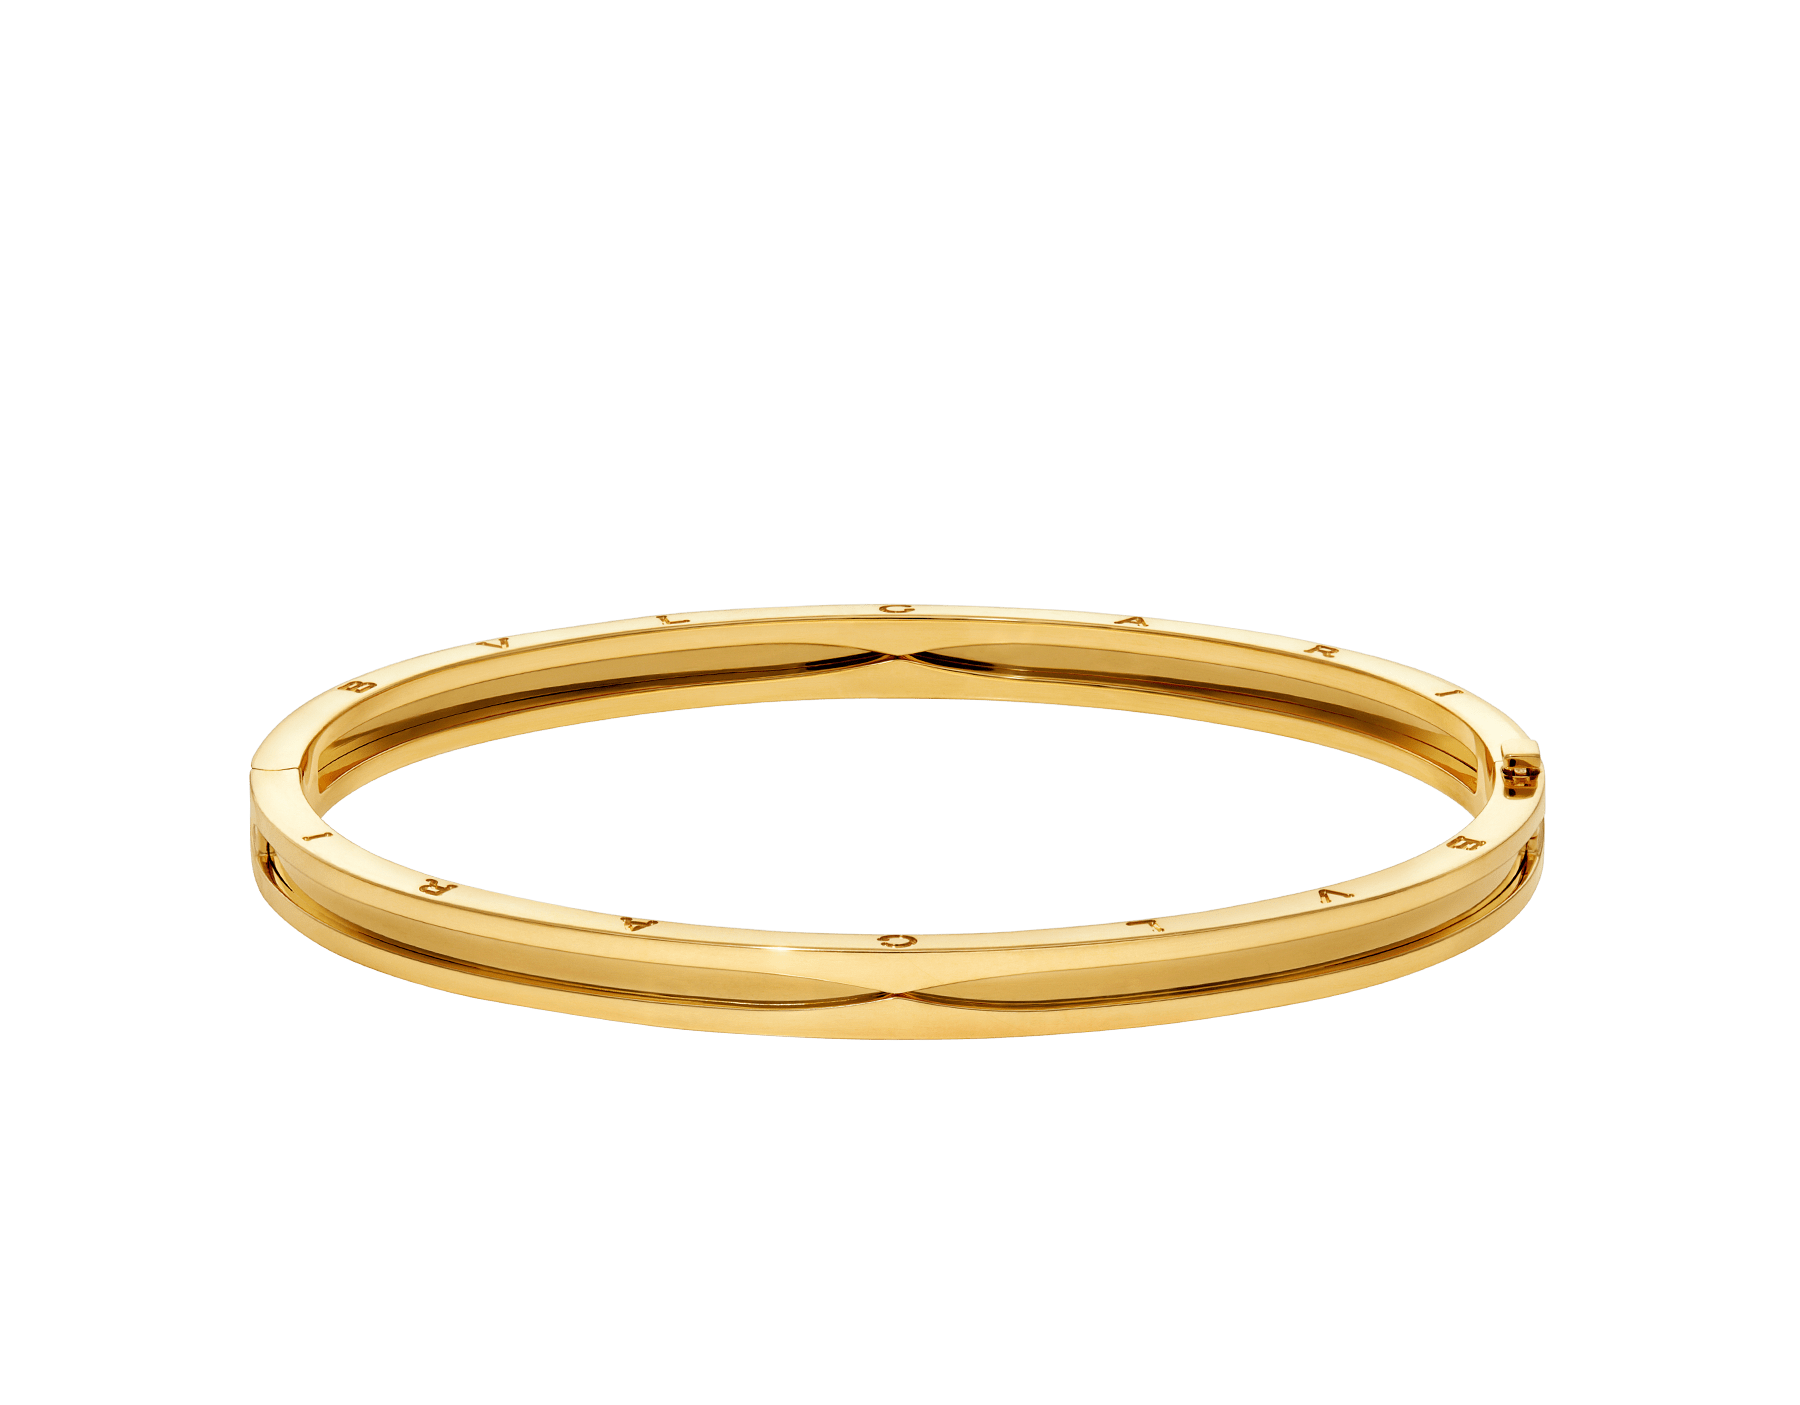 Pulsera rígida B.zero1 en oro amarillo de 18qt BR858726 image 2